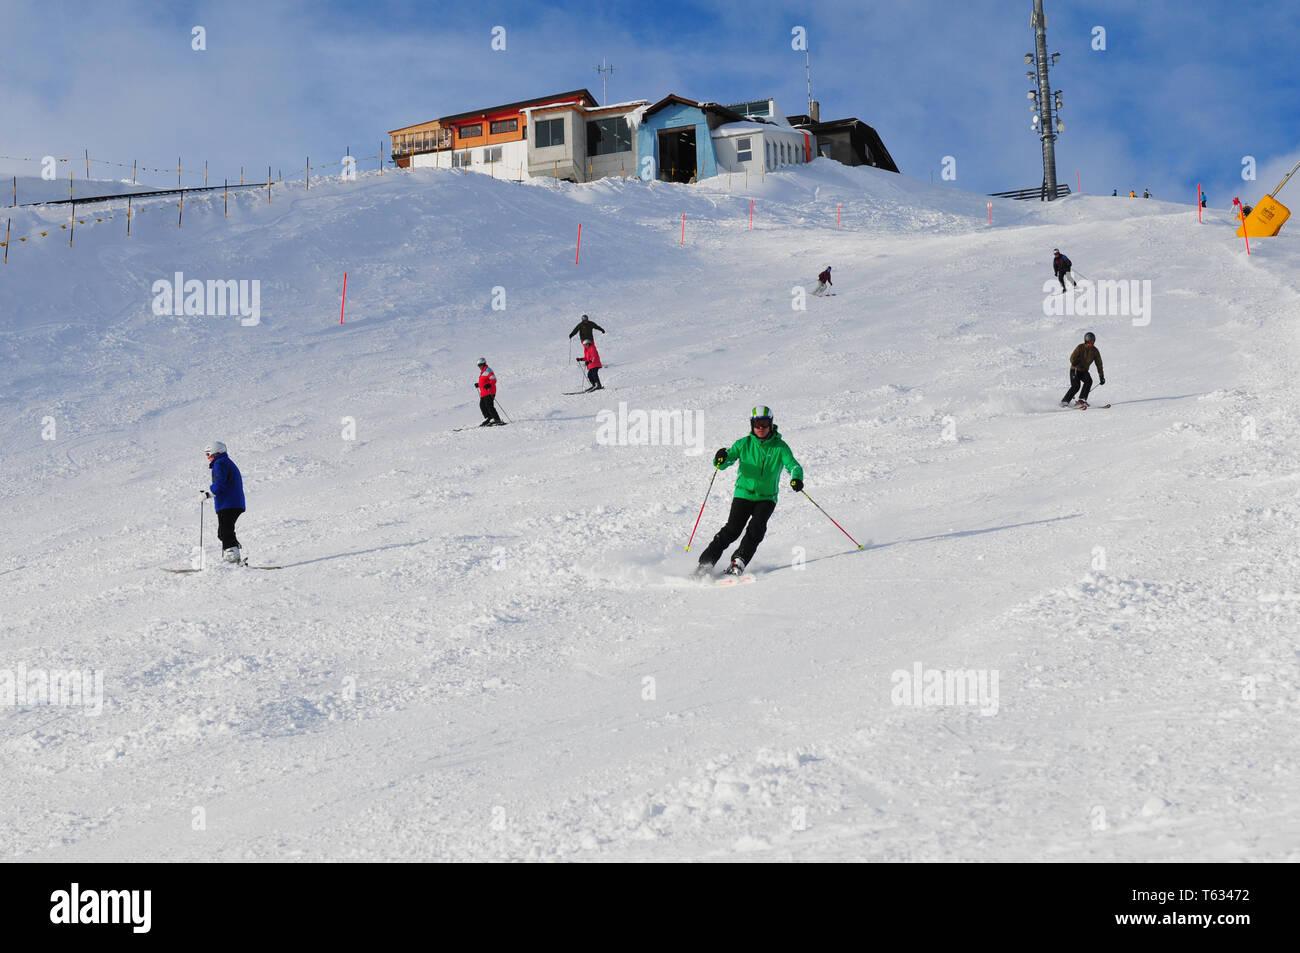 Swiss alps: Winter sport region Weissfluhjoch at Davos city - Stock Image